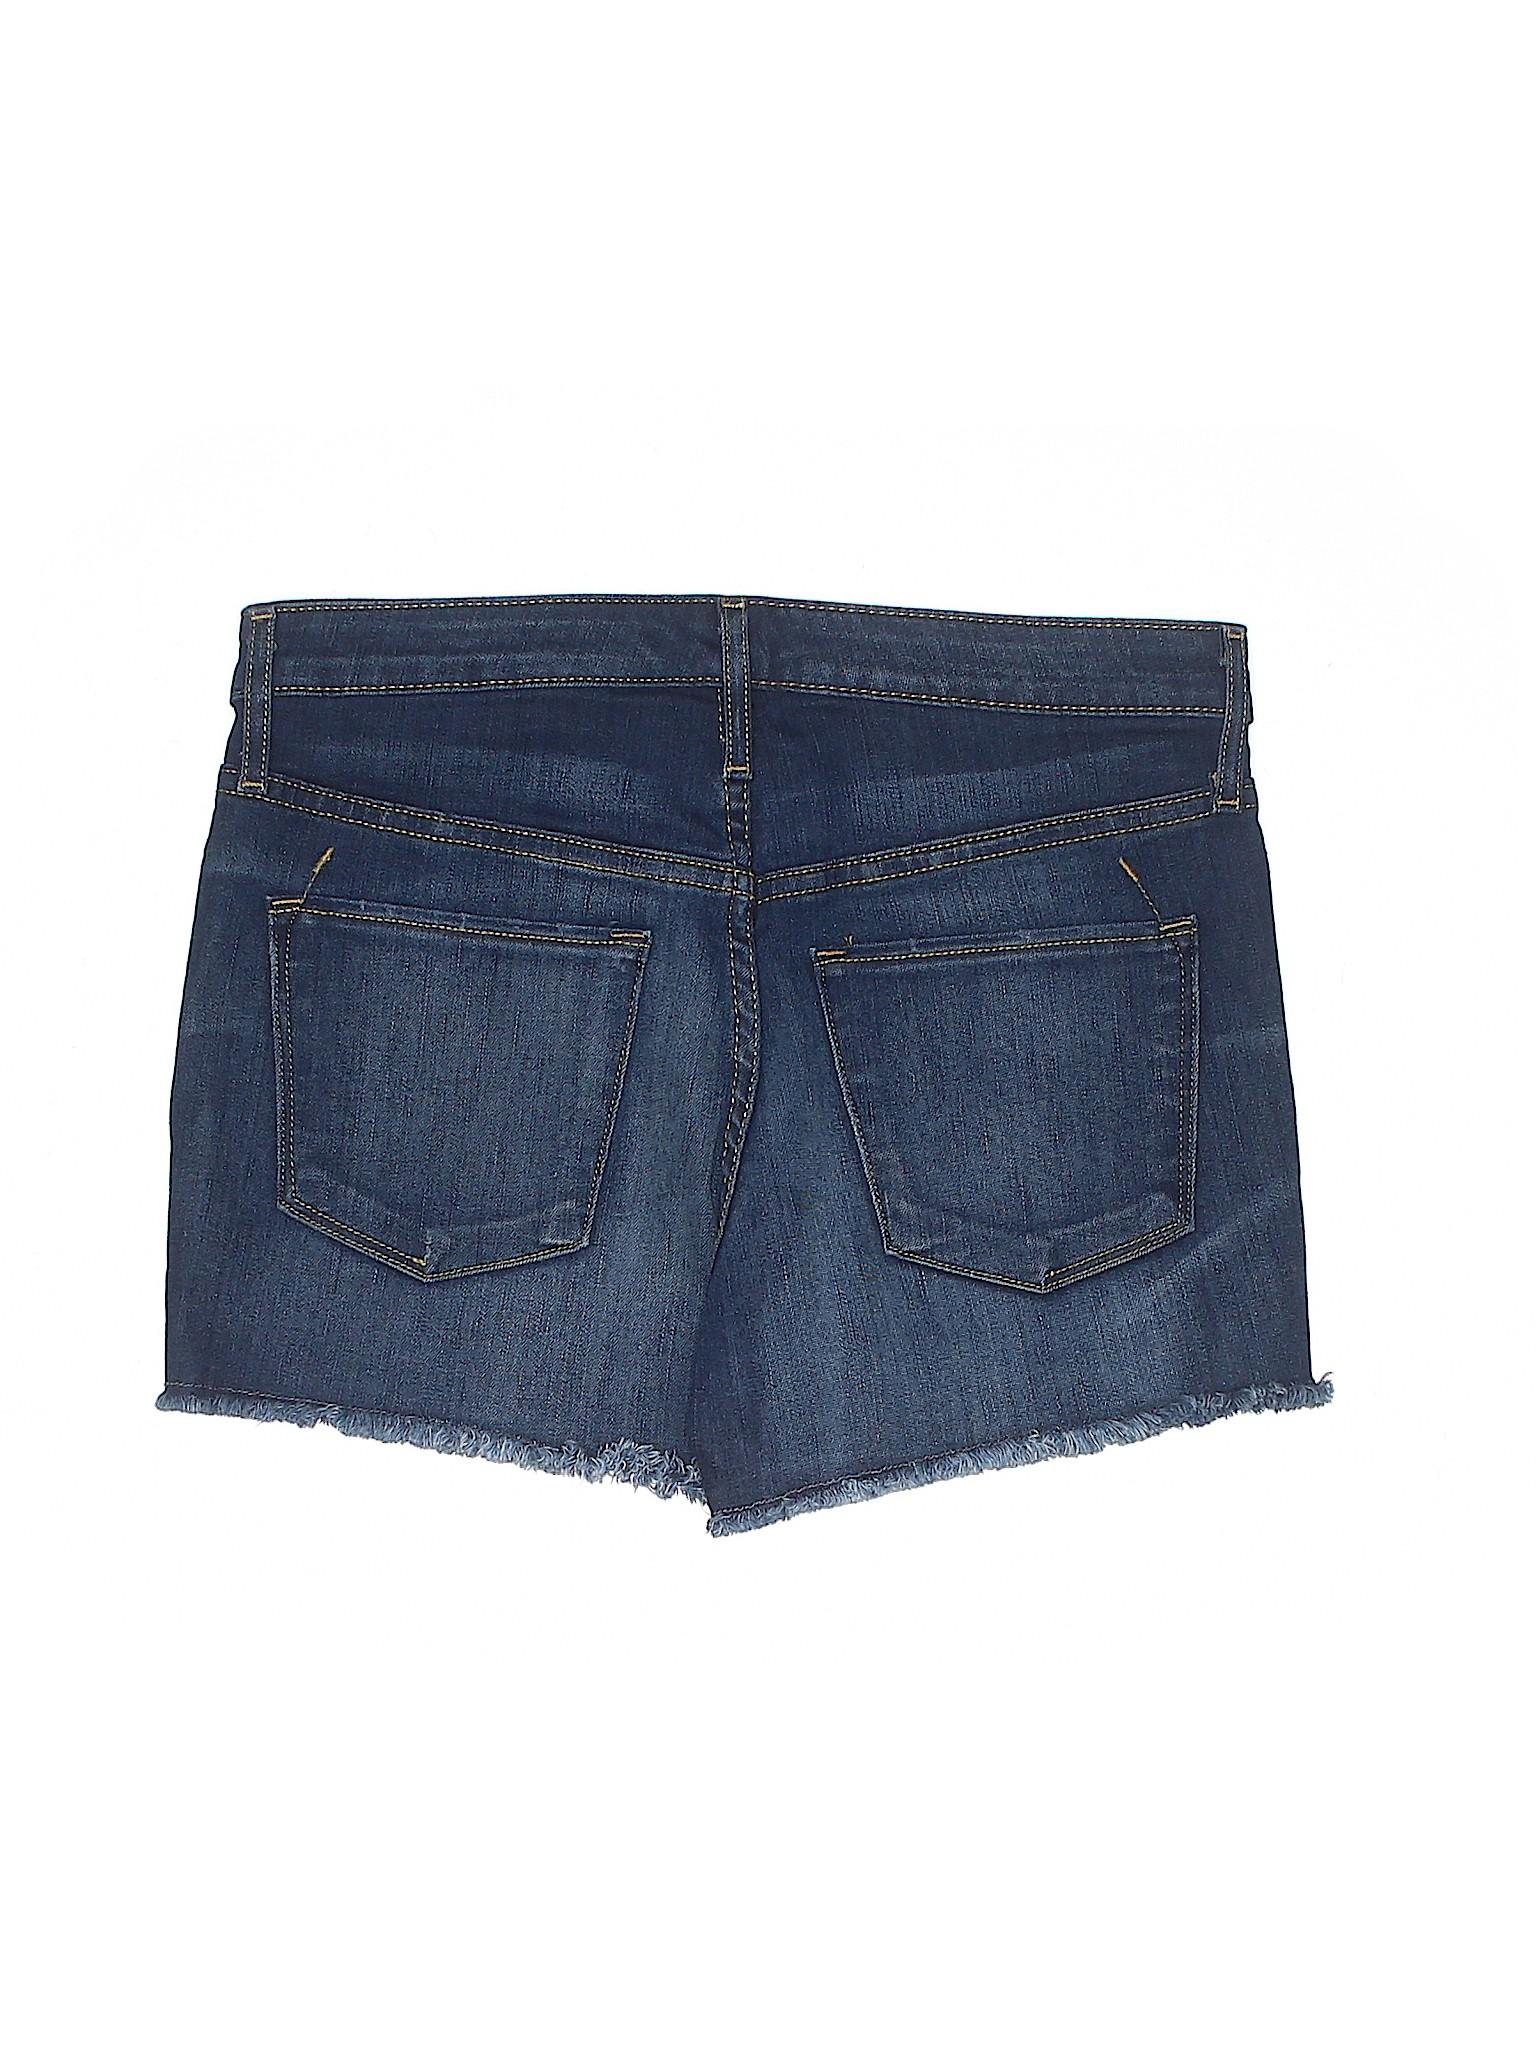 Shorts Boutique Mossimo Shorts Boutique Mossimo Denim Boutique Mossimo Denim AqCCw7UP